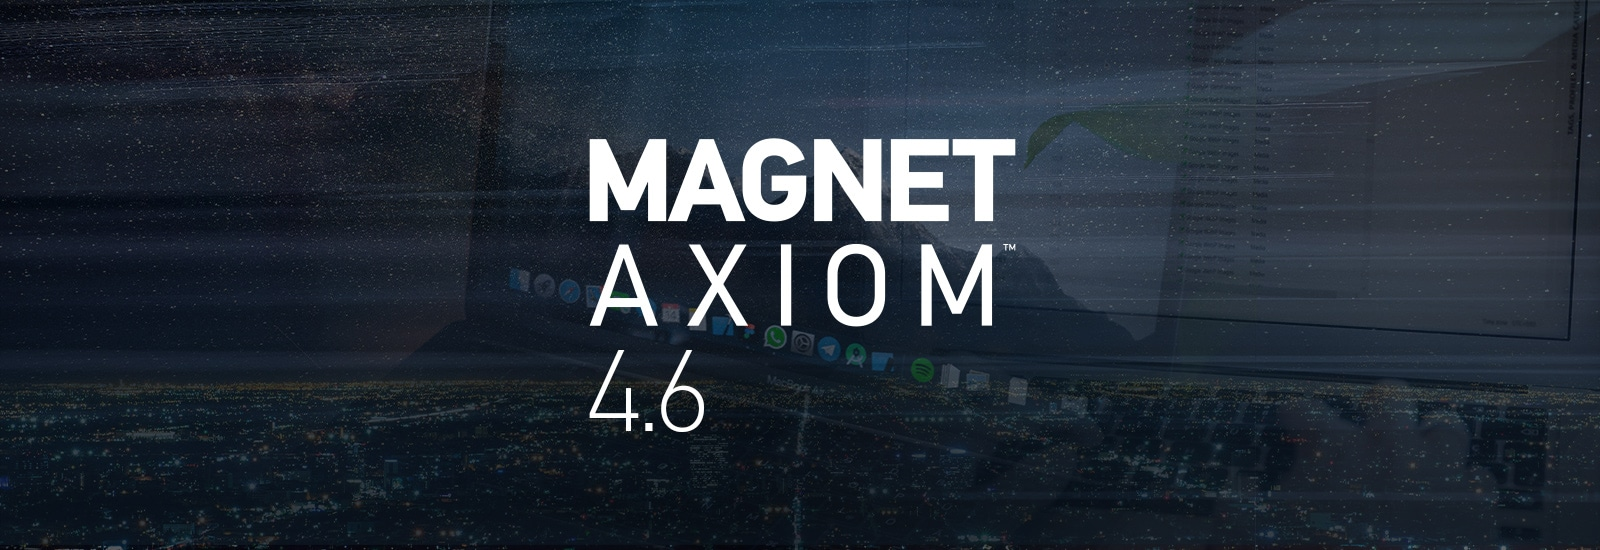 AXIOM 4.6